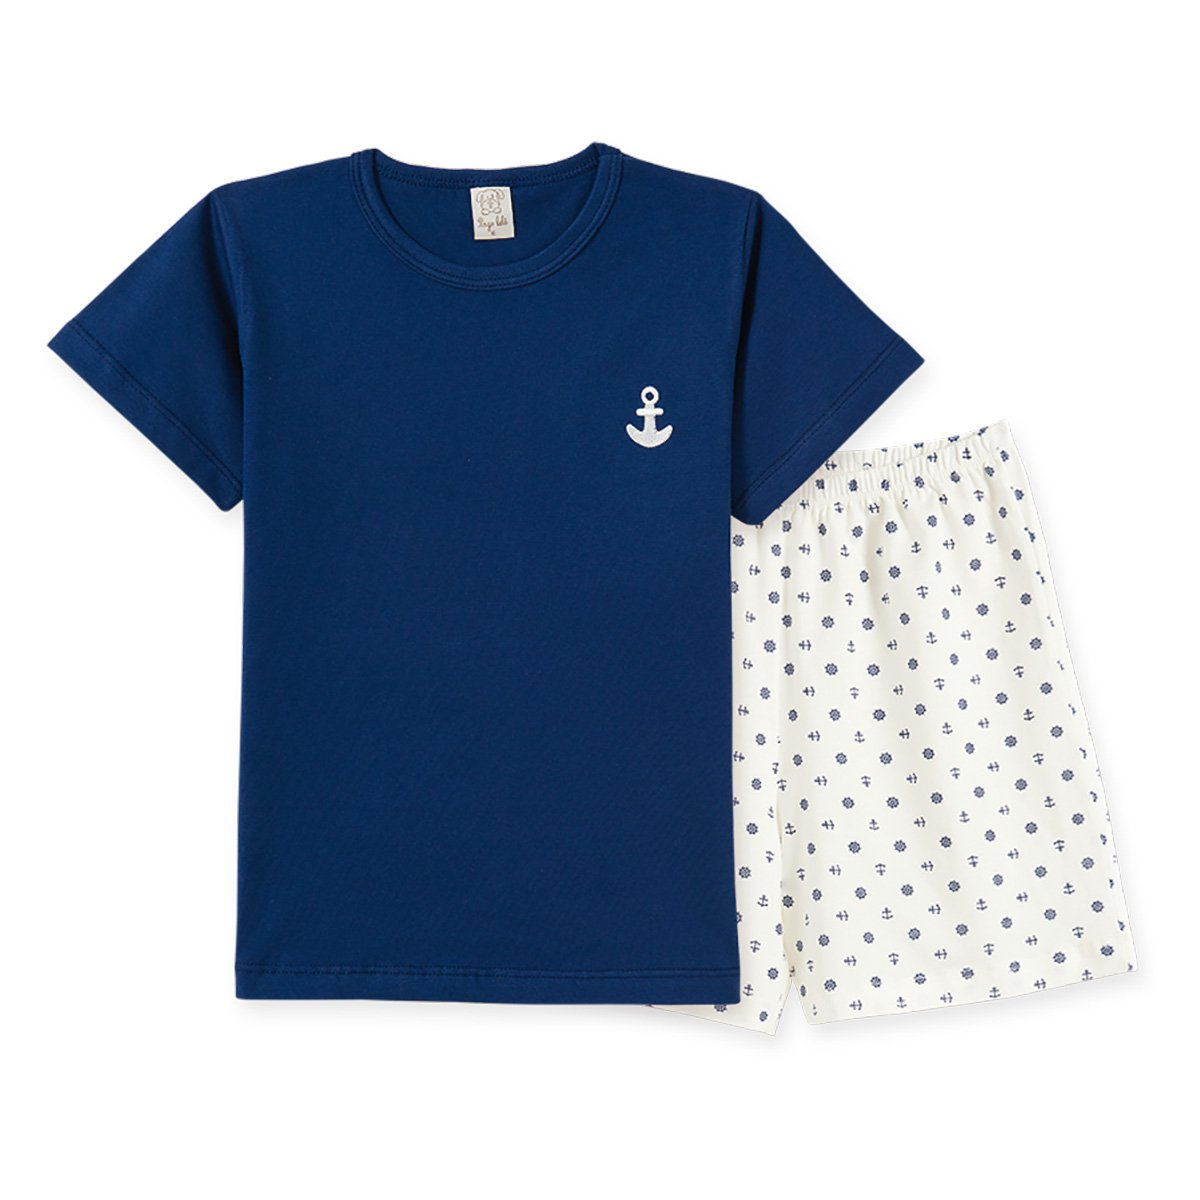 Pijama Infantil Pingo Lelê Camiseta Âncora + Bermuda Masculino